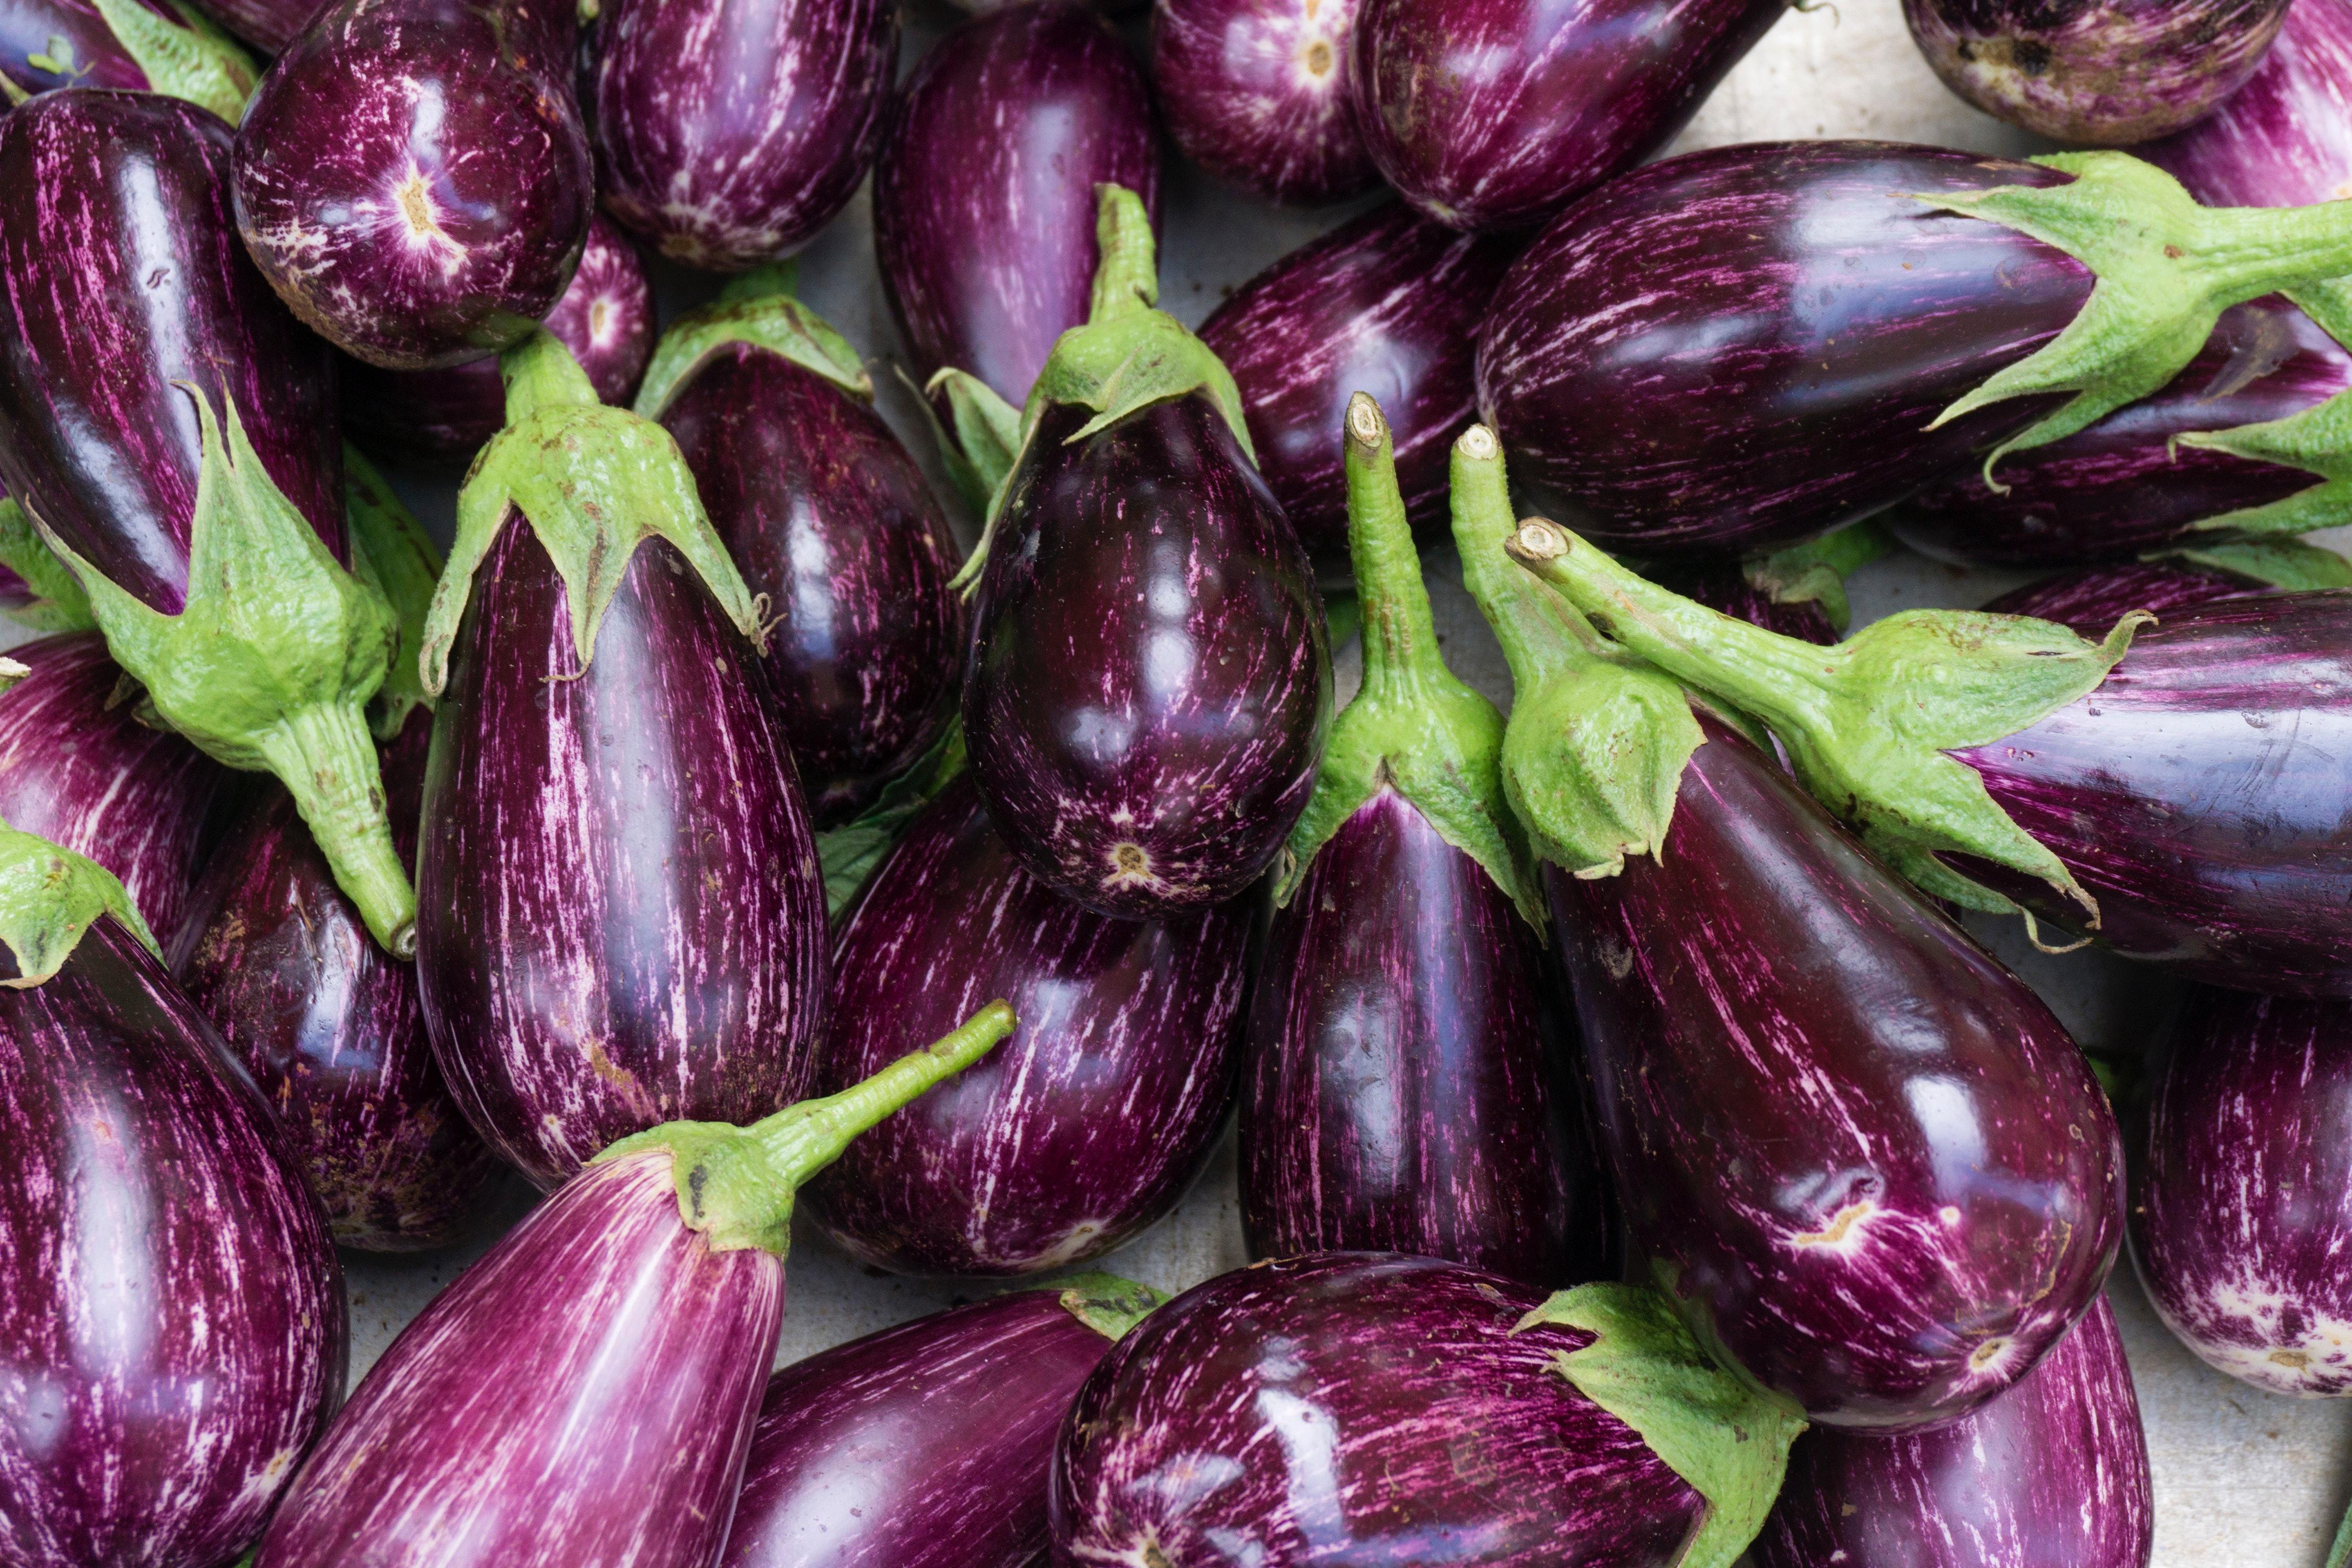 Organic eggplant aubergine photo